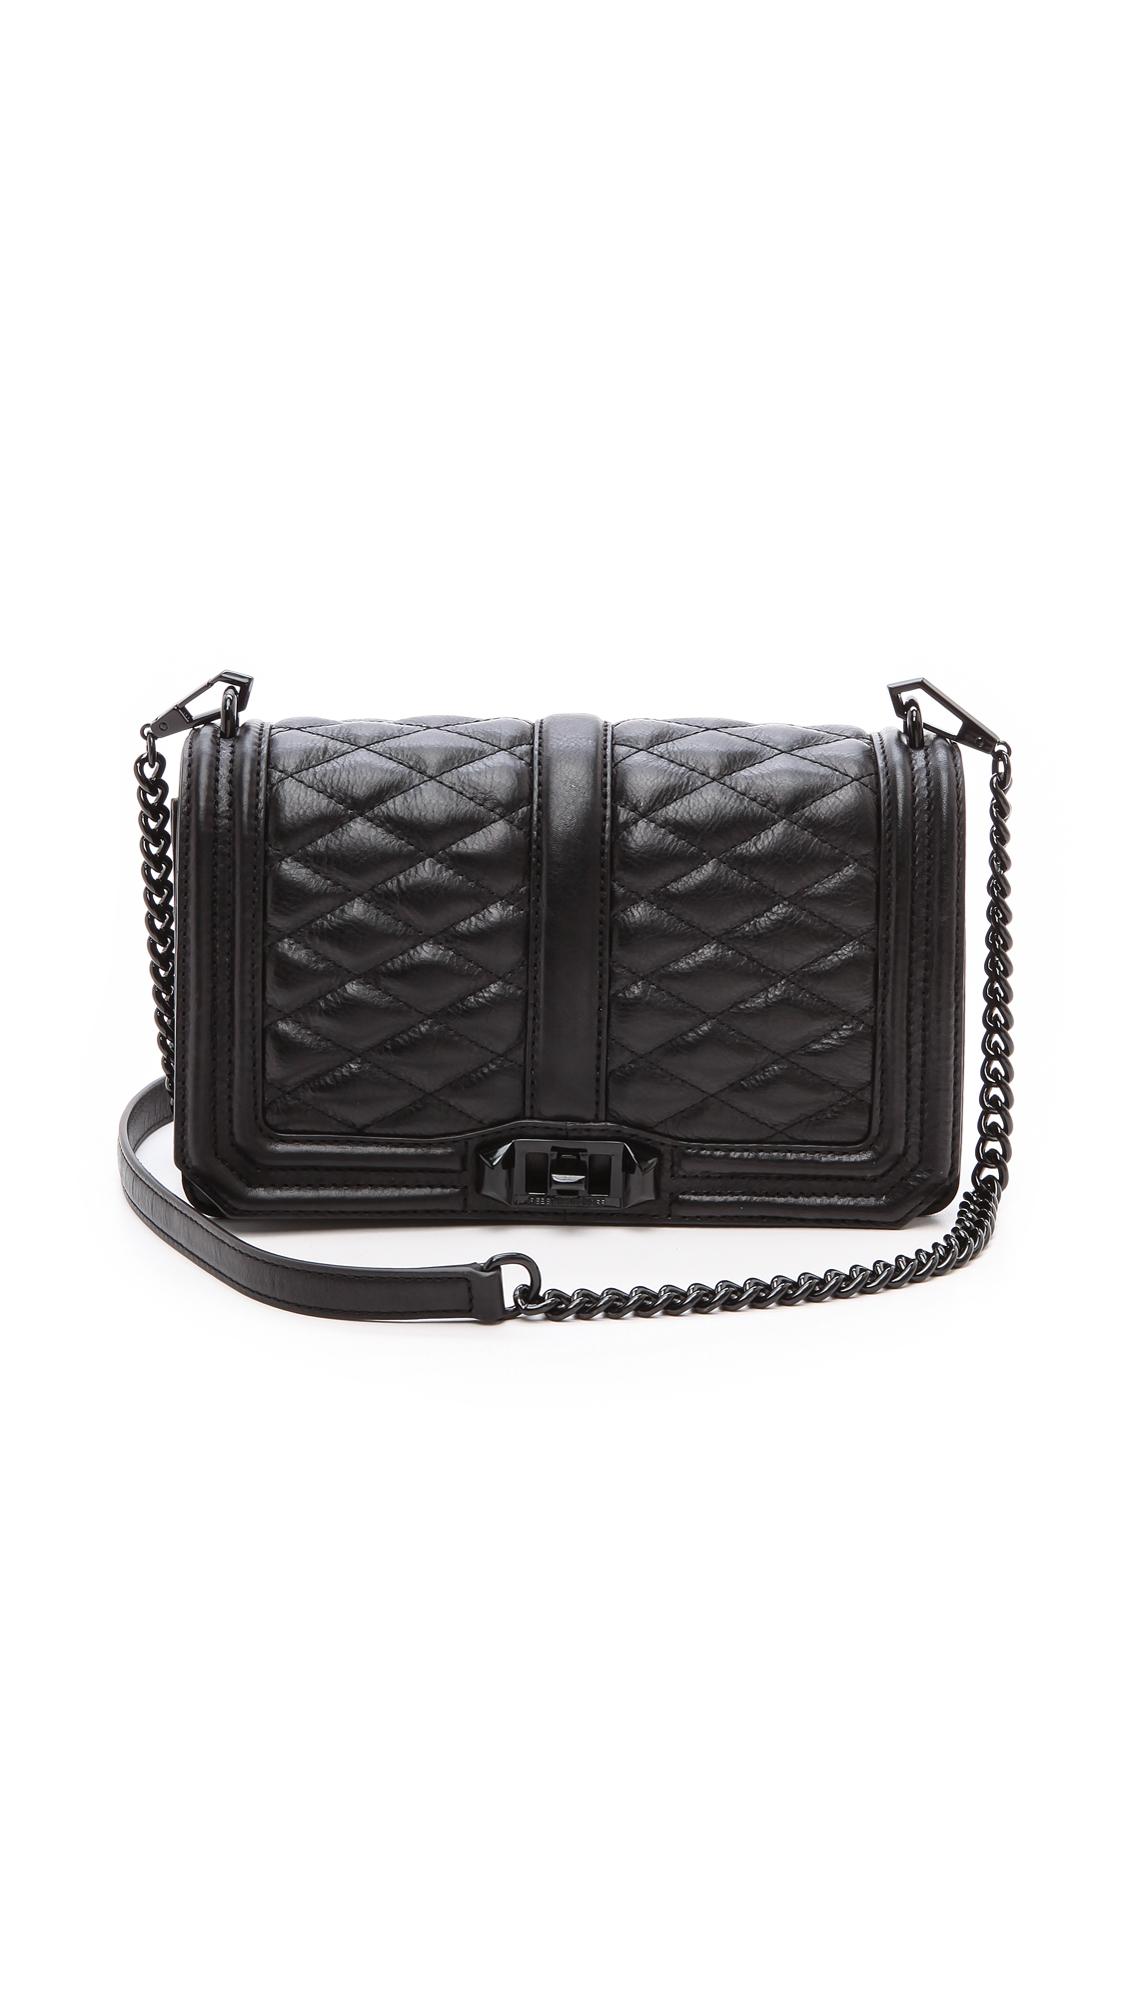 Rebecca Minkoff Love Cross Body Bag - Black